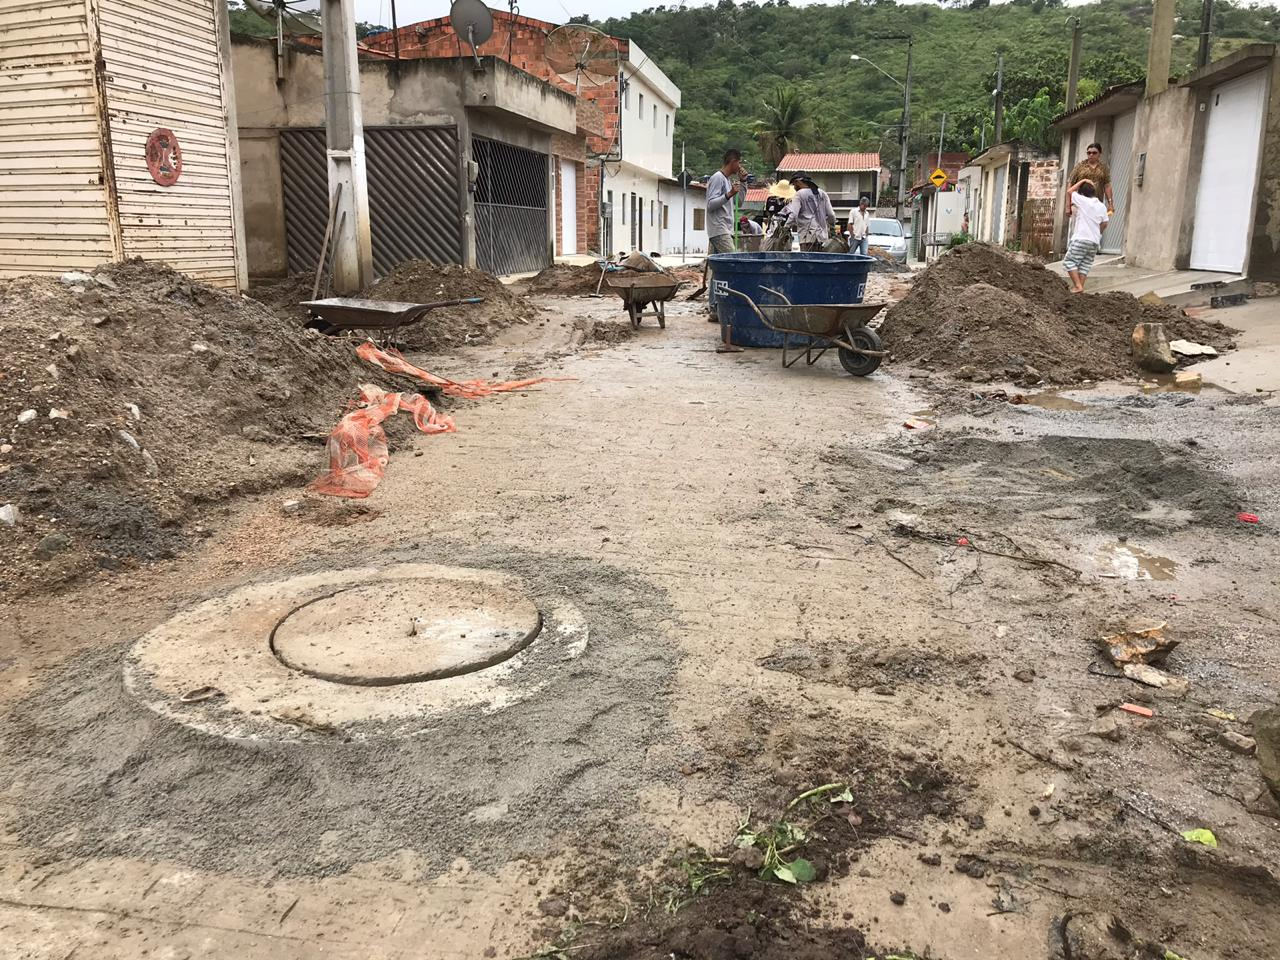 https://caruaru.pe.gov.br/wp-content/uploads/2020/01/foto-3-1.jpeg